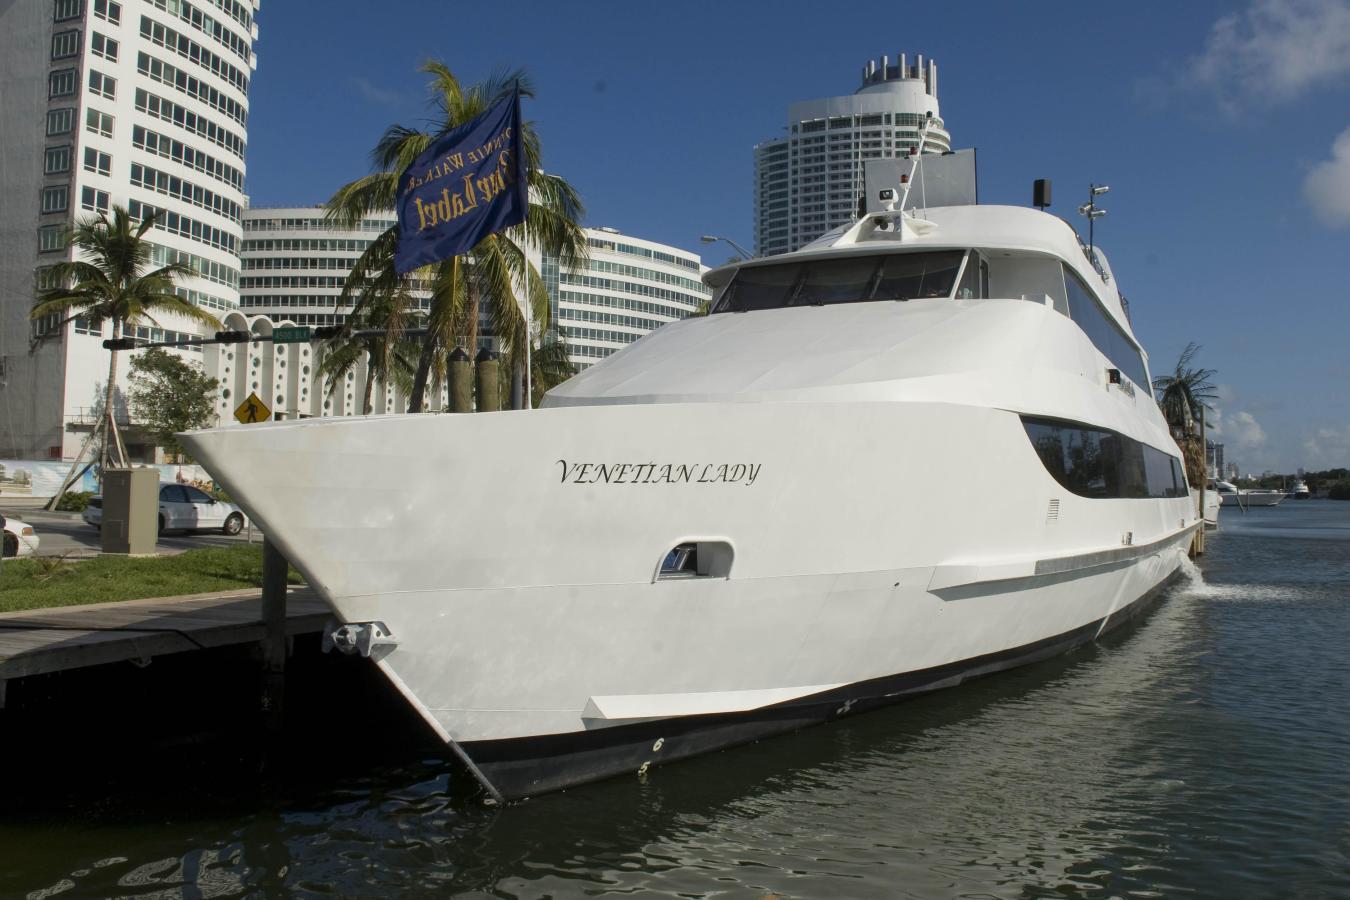 Venetian Lady Yacht Charters